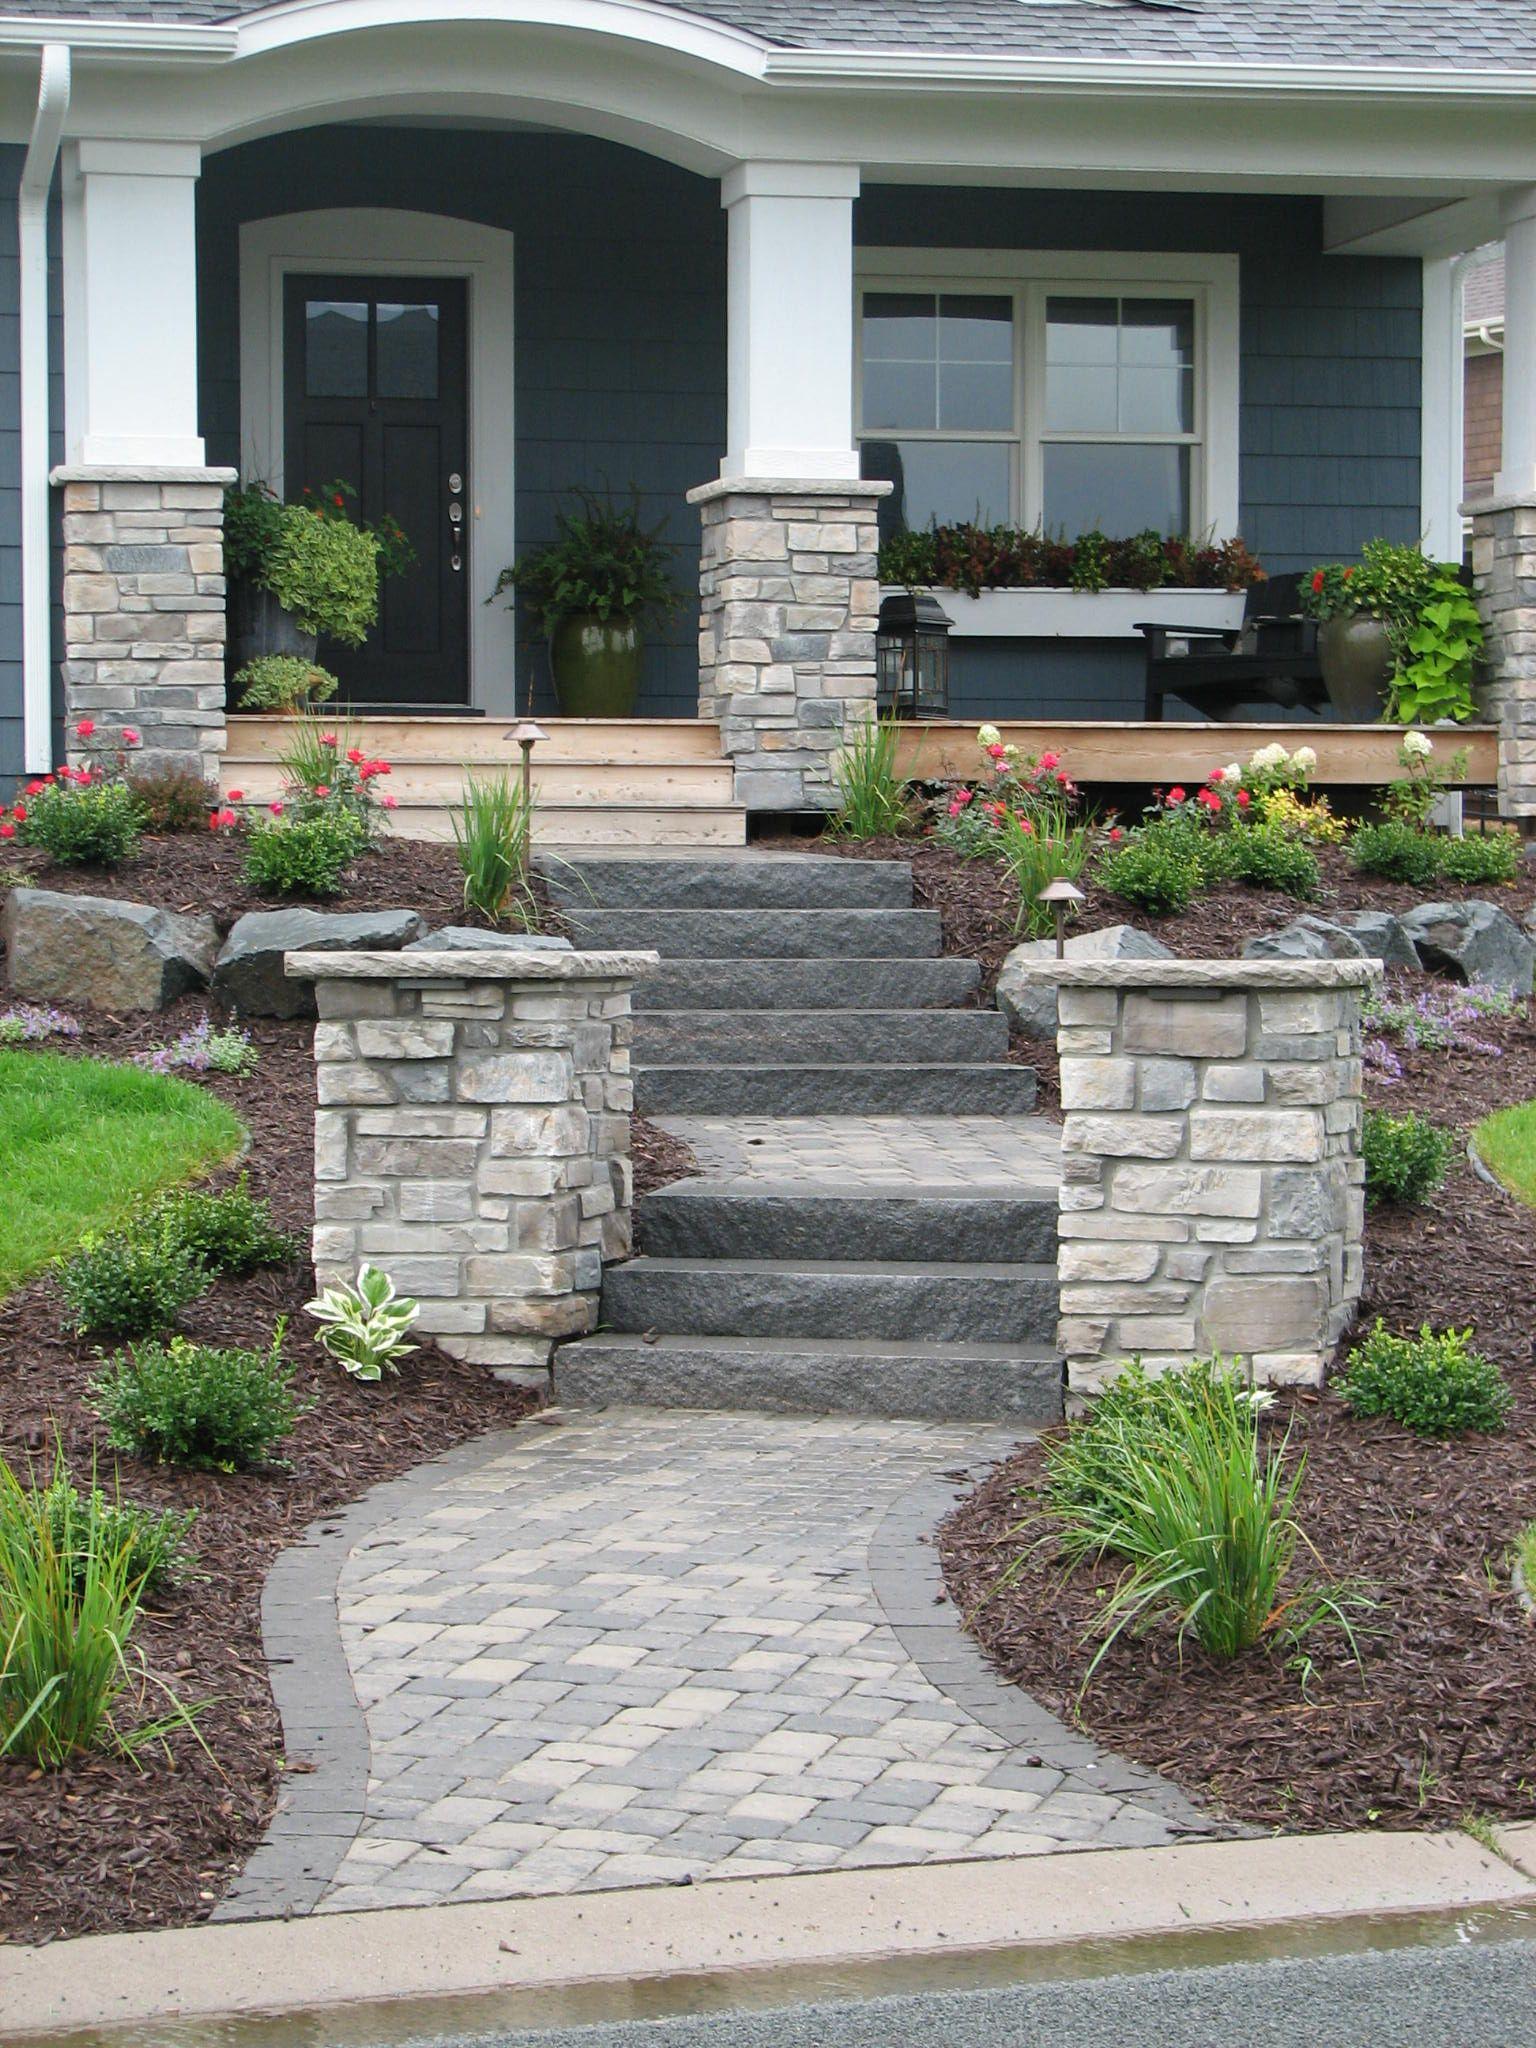 Paver Walkway Natural Stone Steps And Flanking Pillars